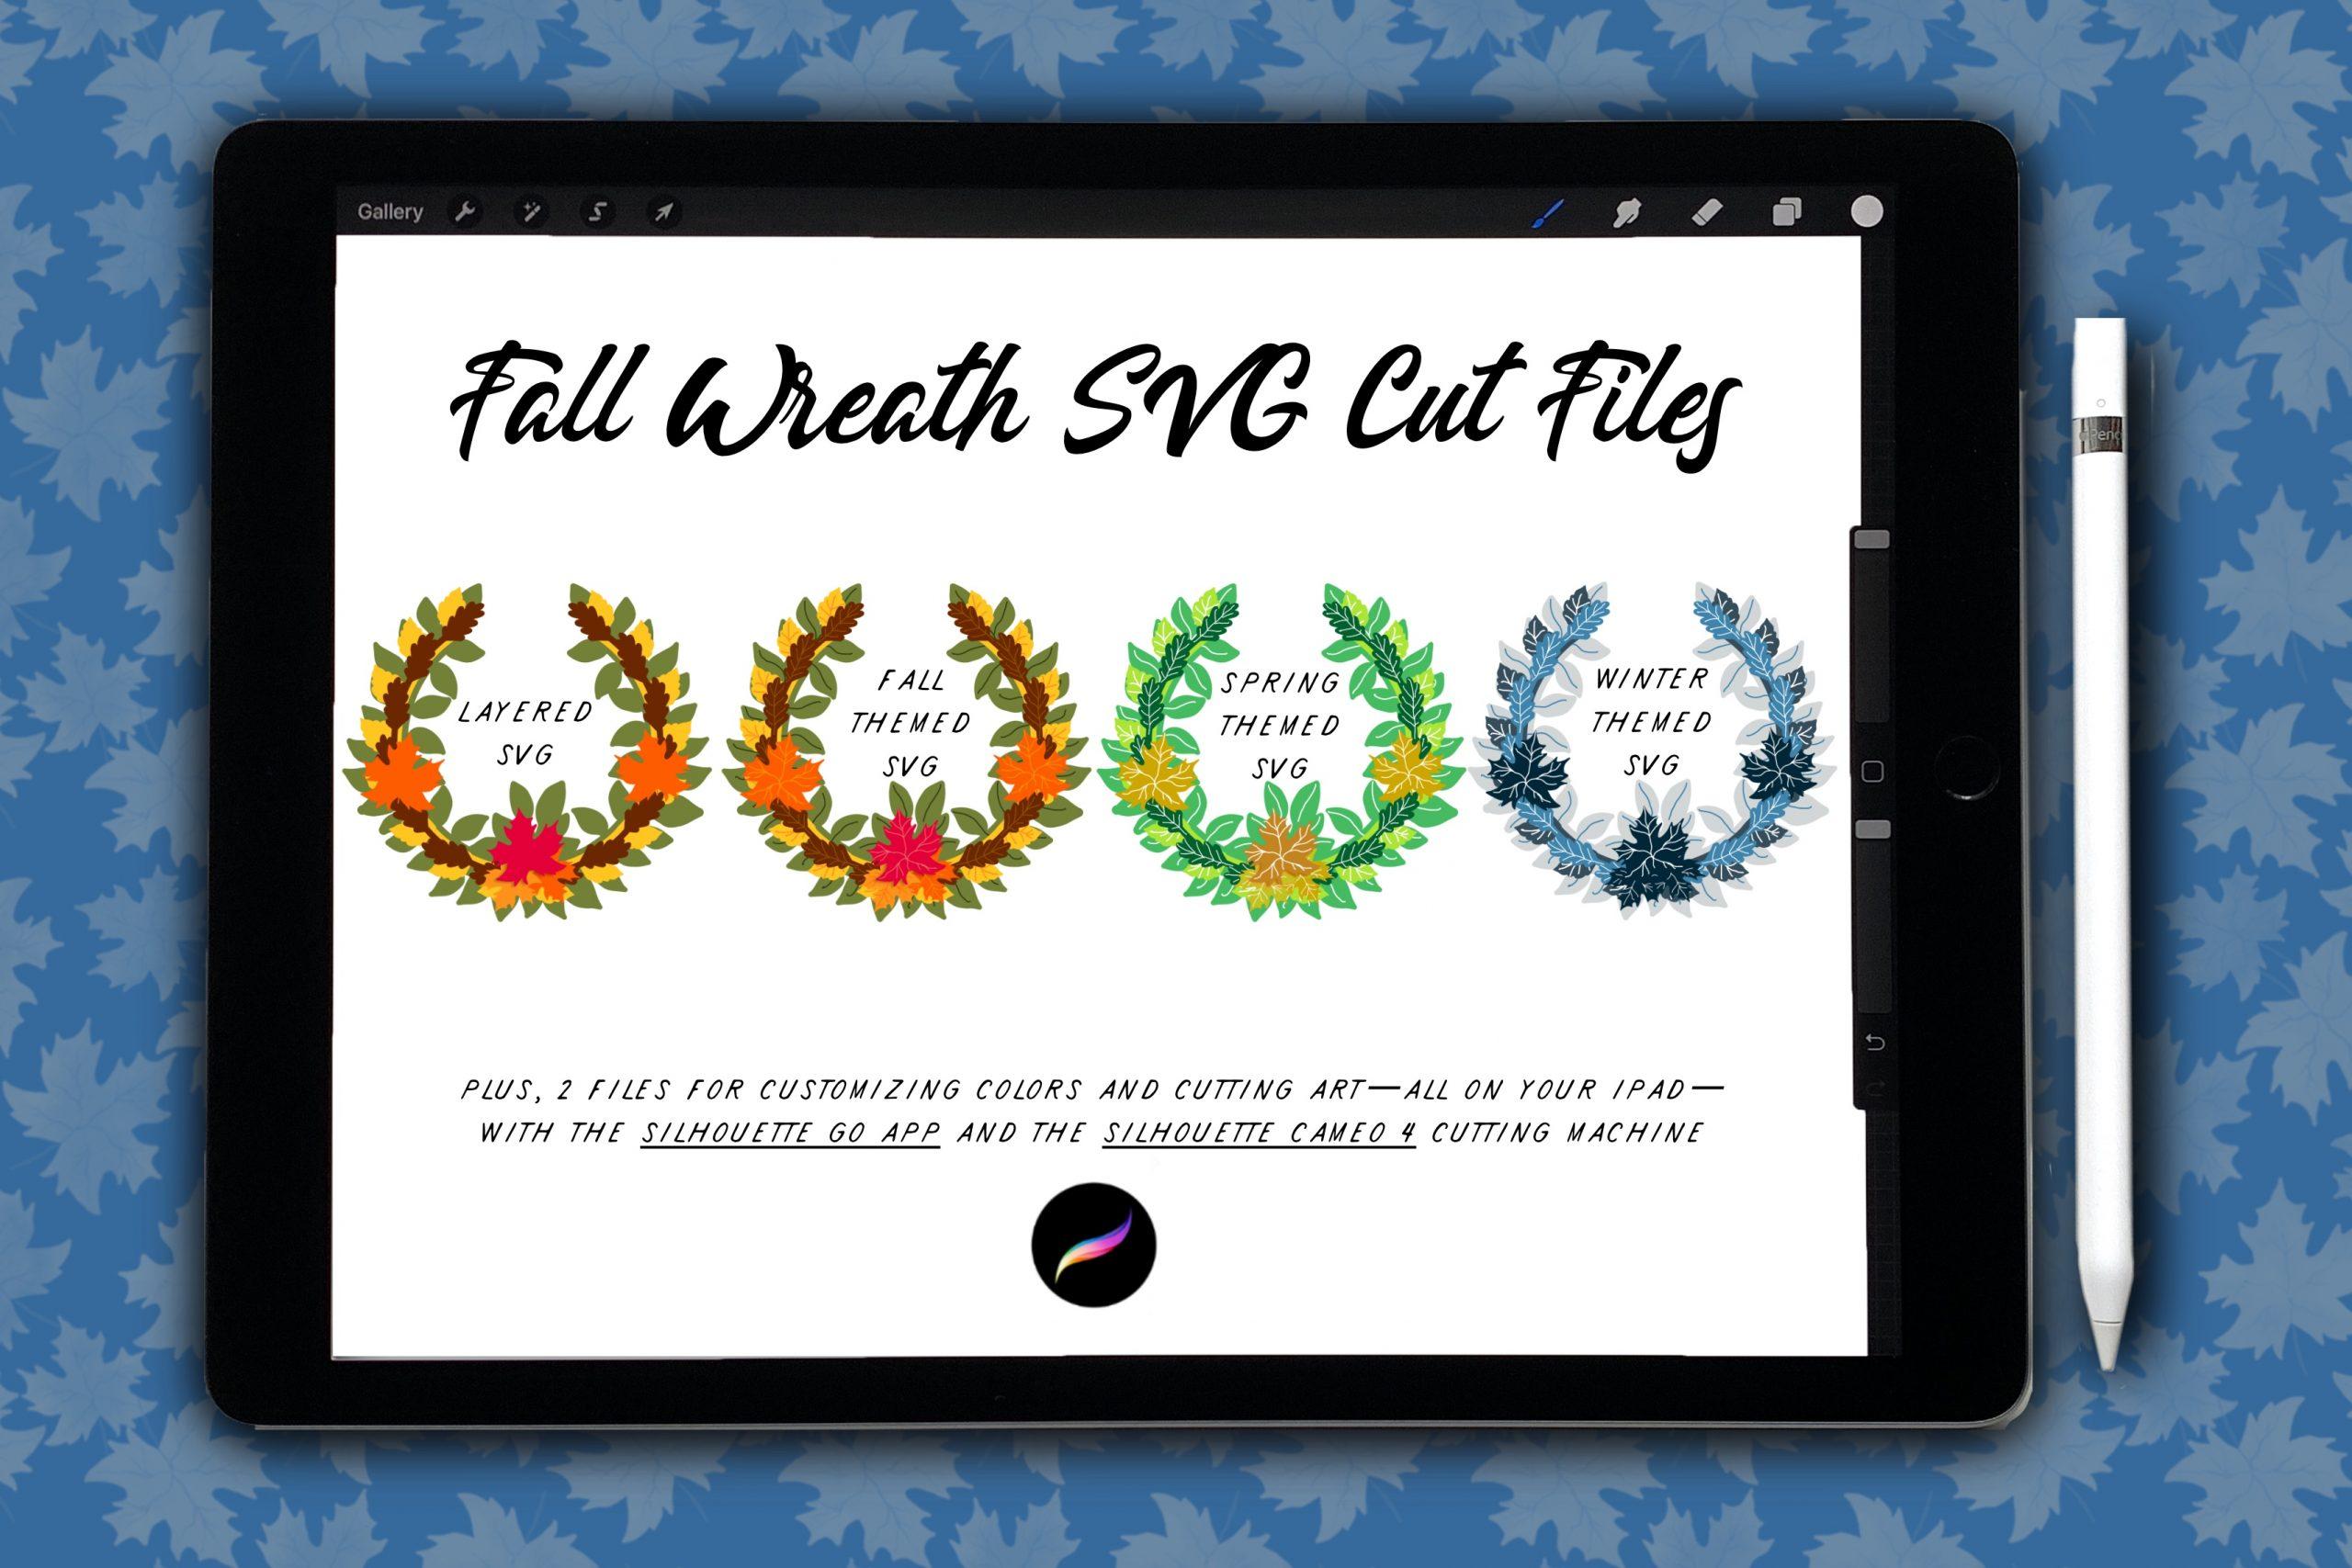 '21 Fall Wreath SVG Kit